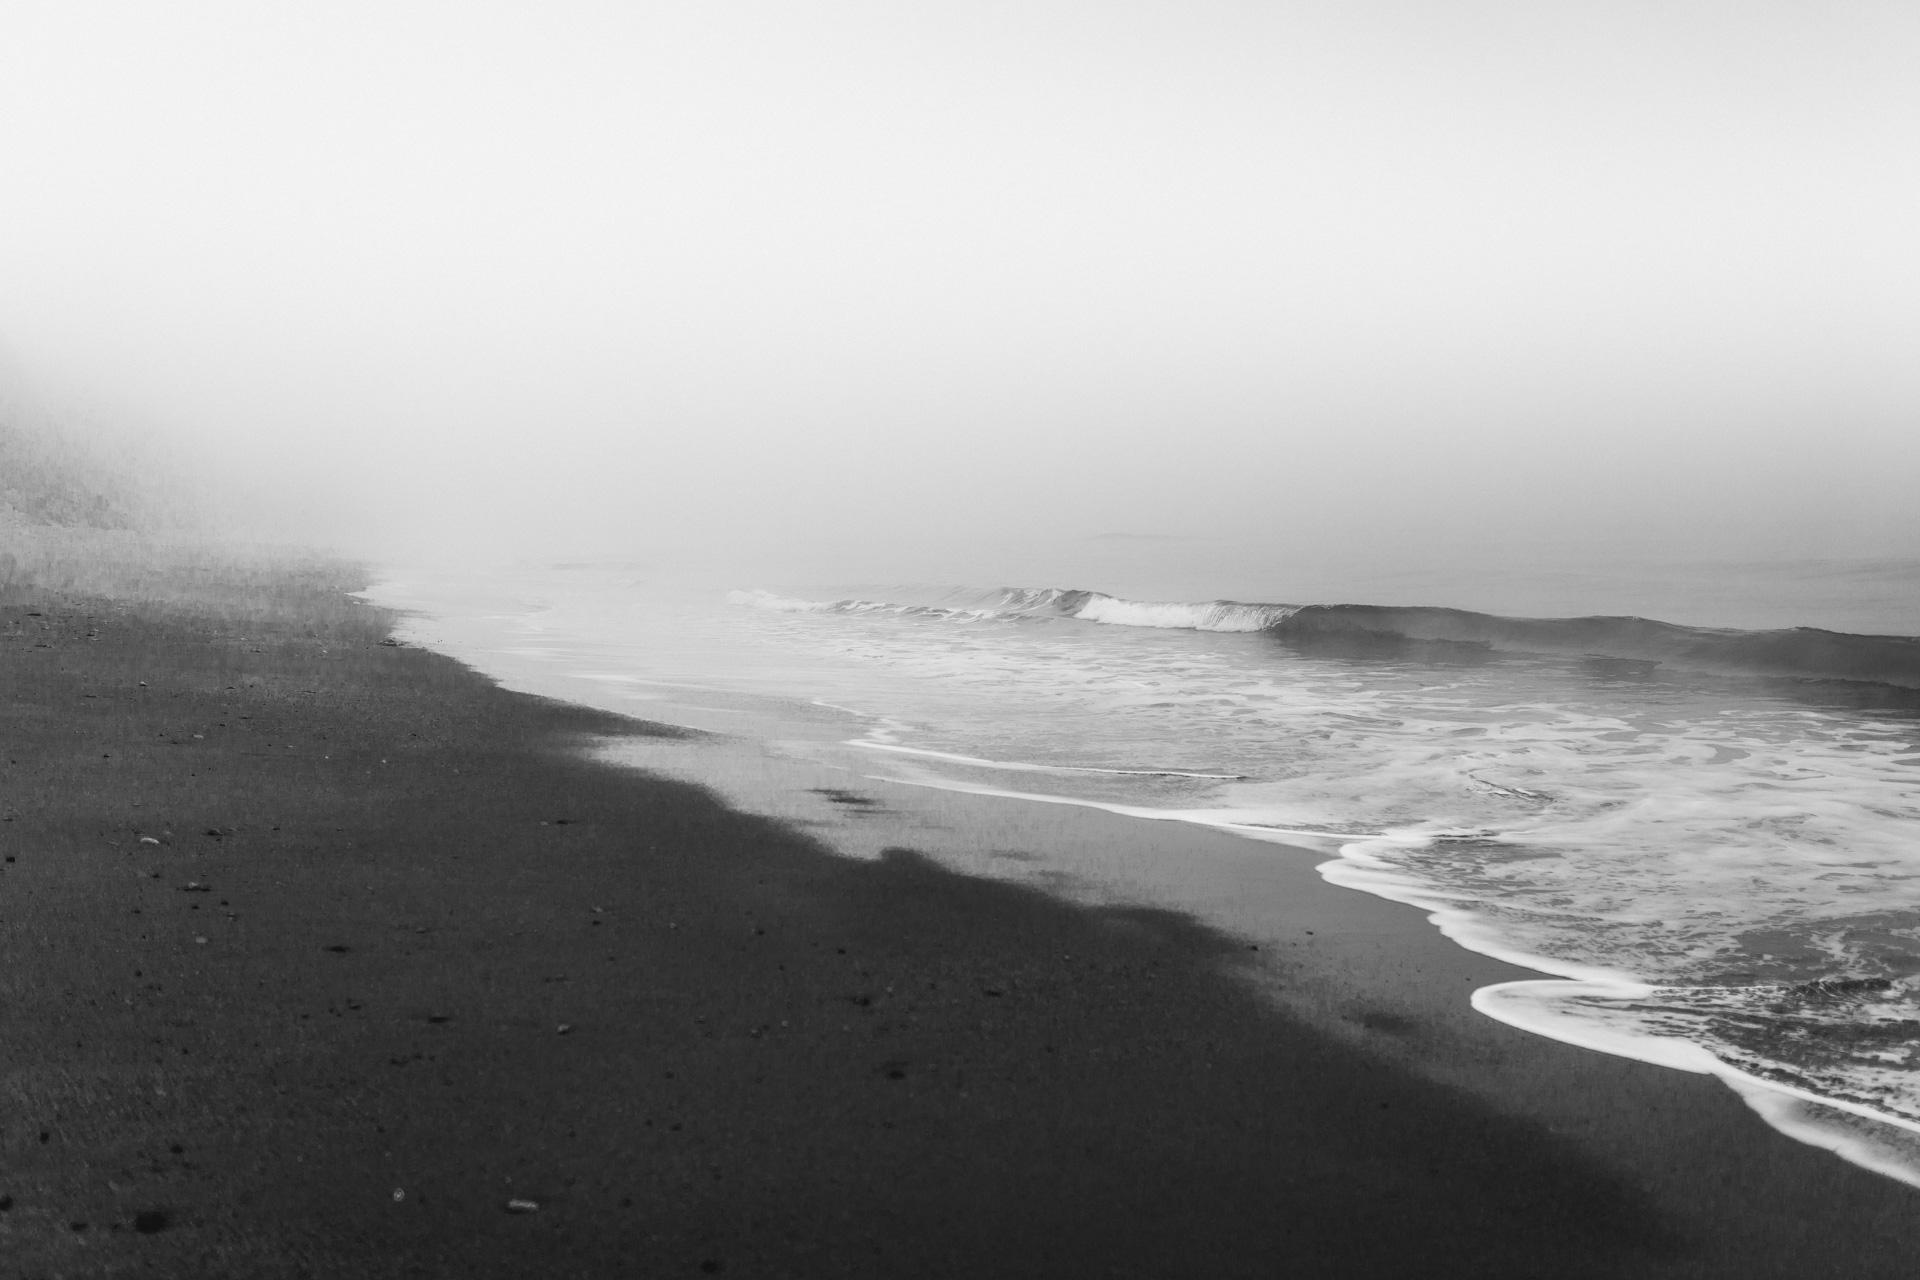 Damien-dohmen-sand-print-lx-one-10